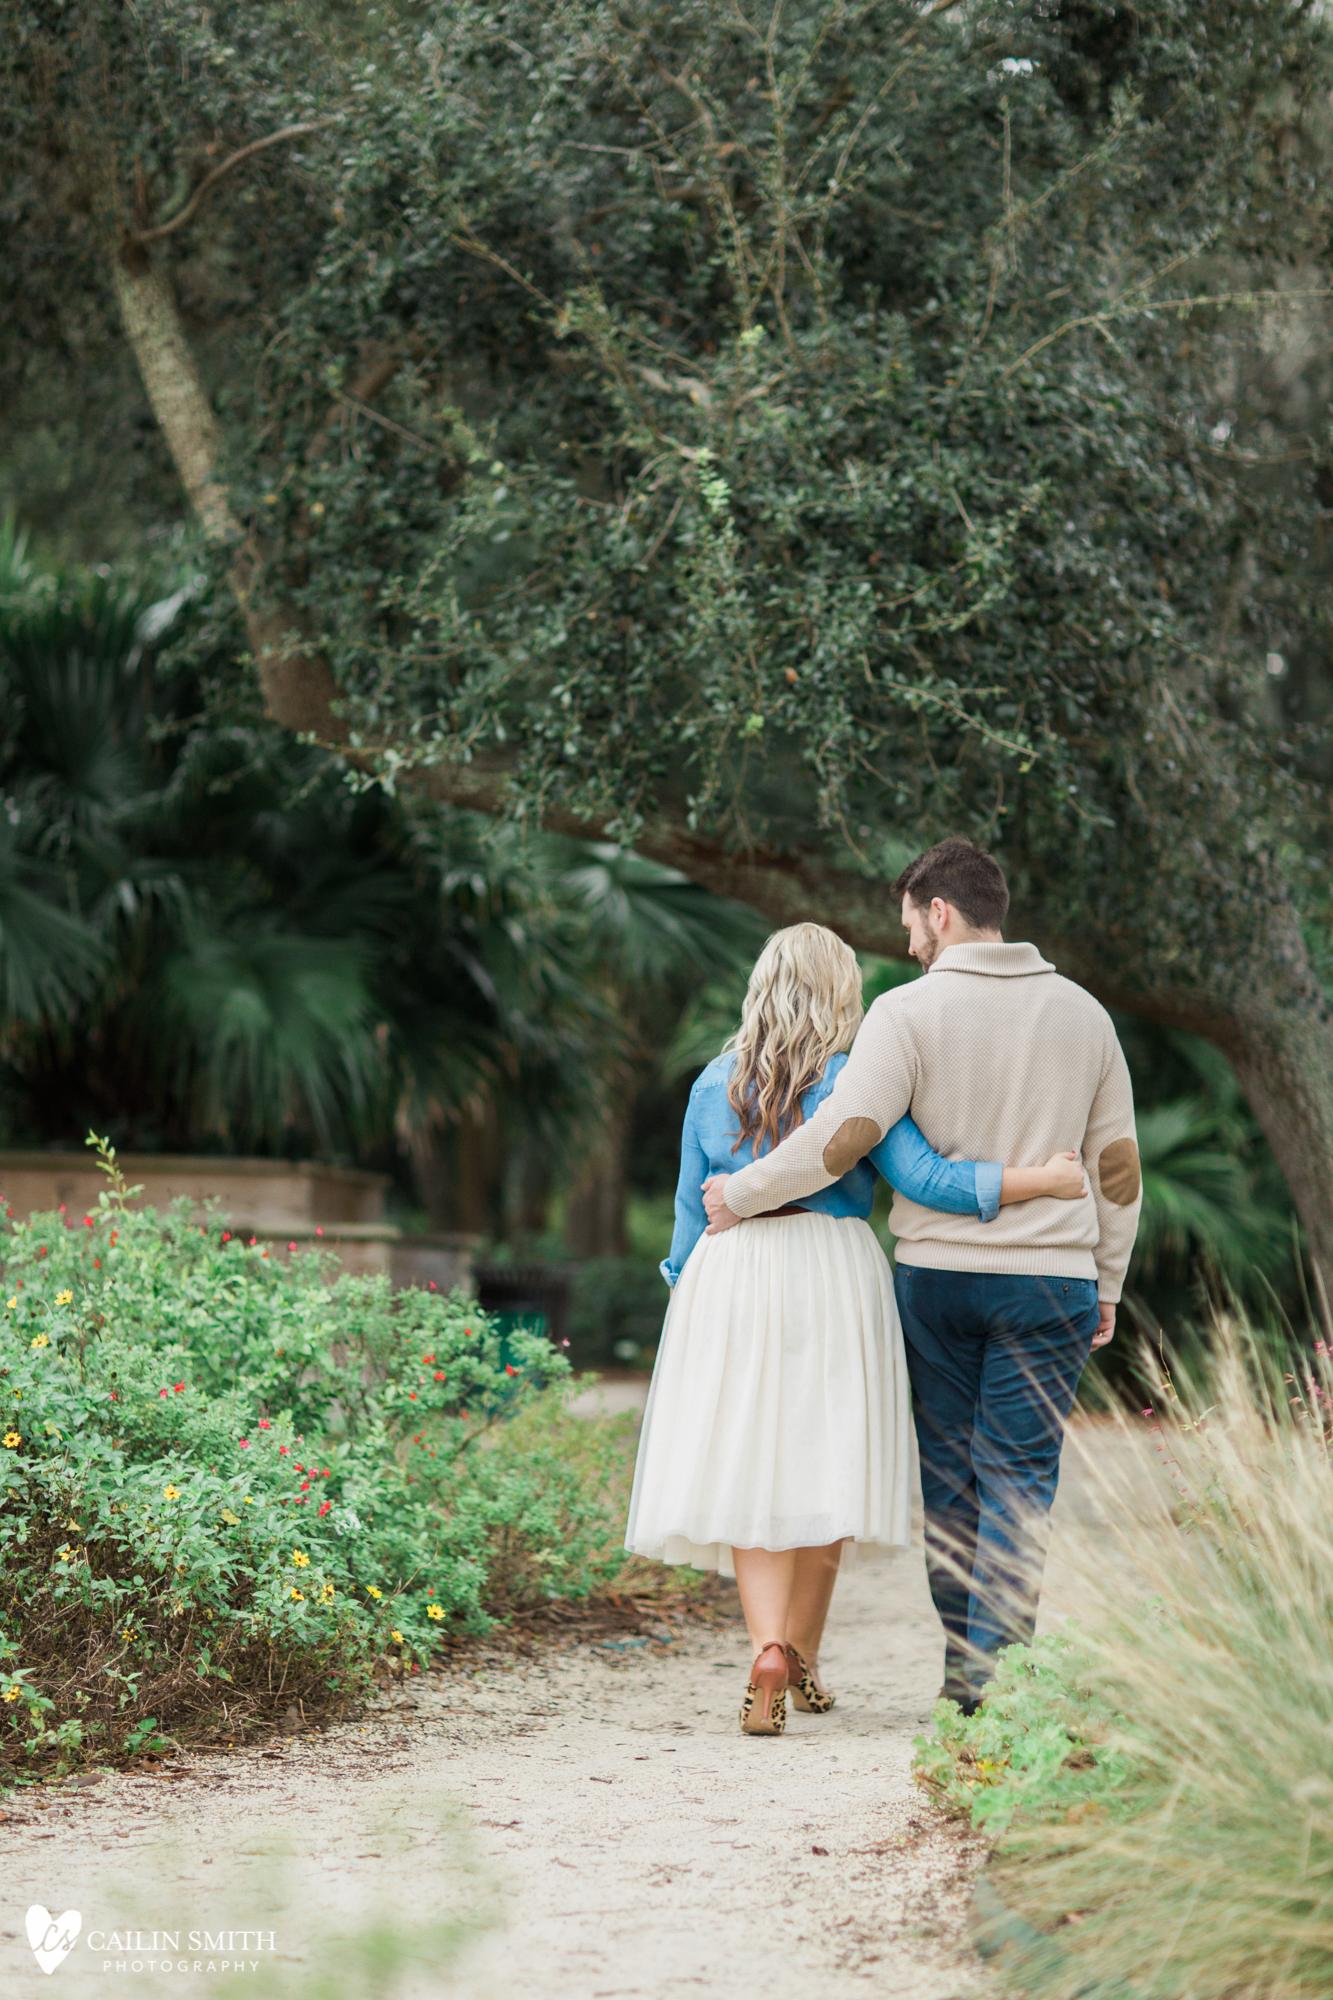 Stephanie_Tyler_Jacksonville_Zoo_Engagement_Photography_031.jpg